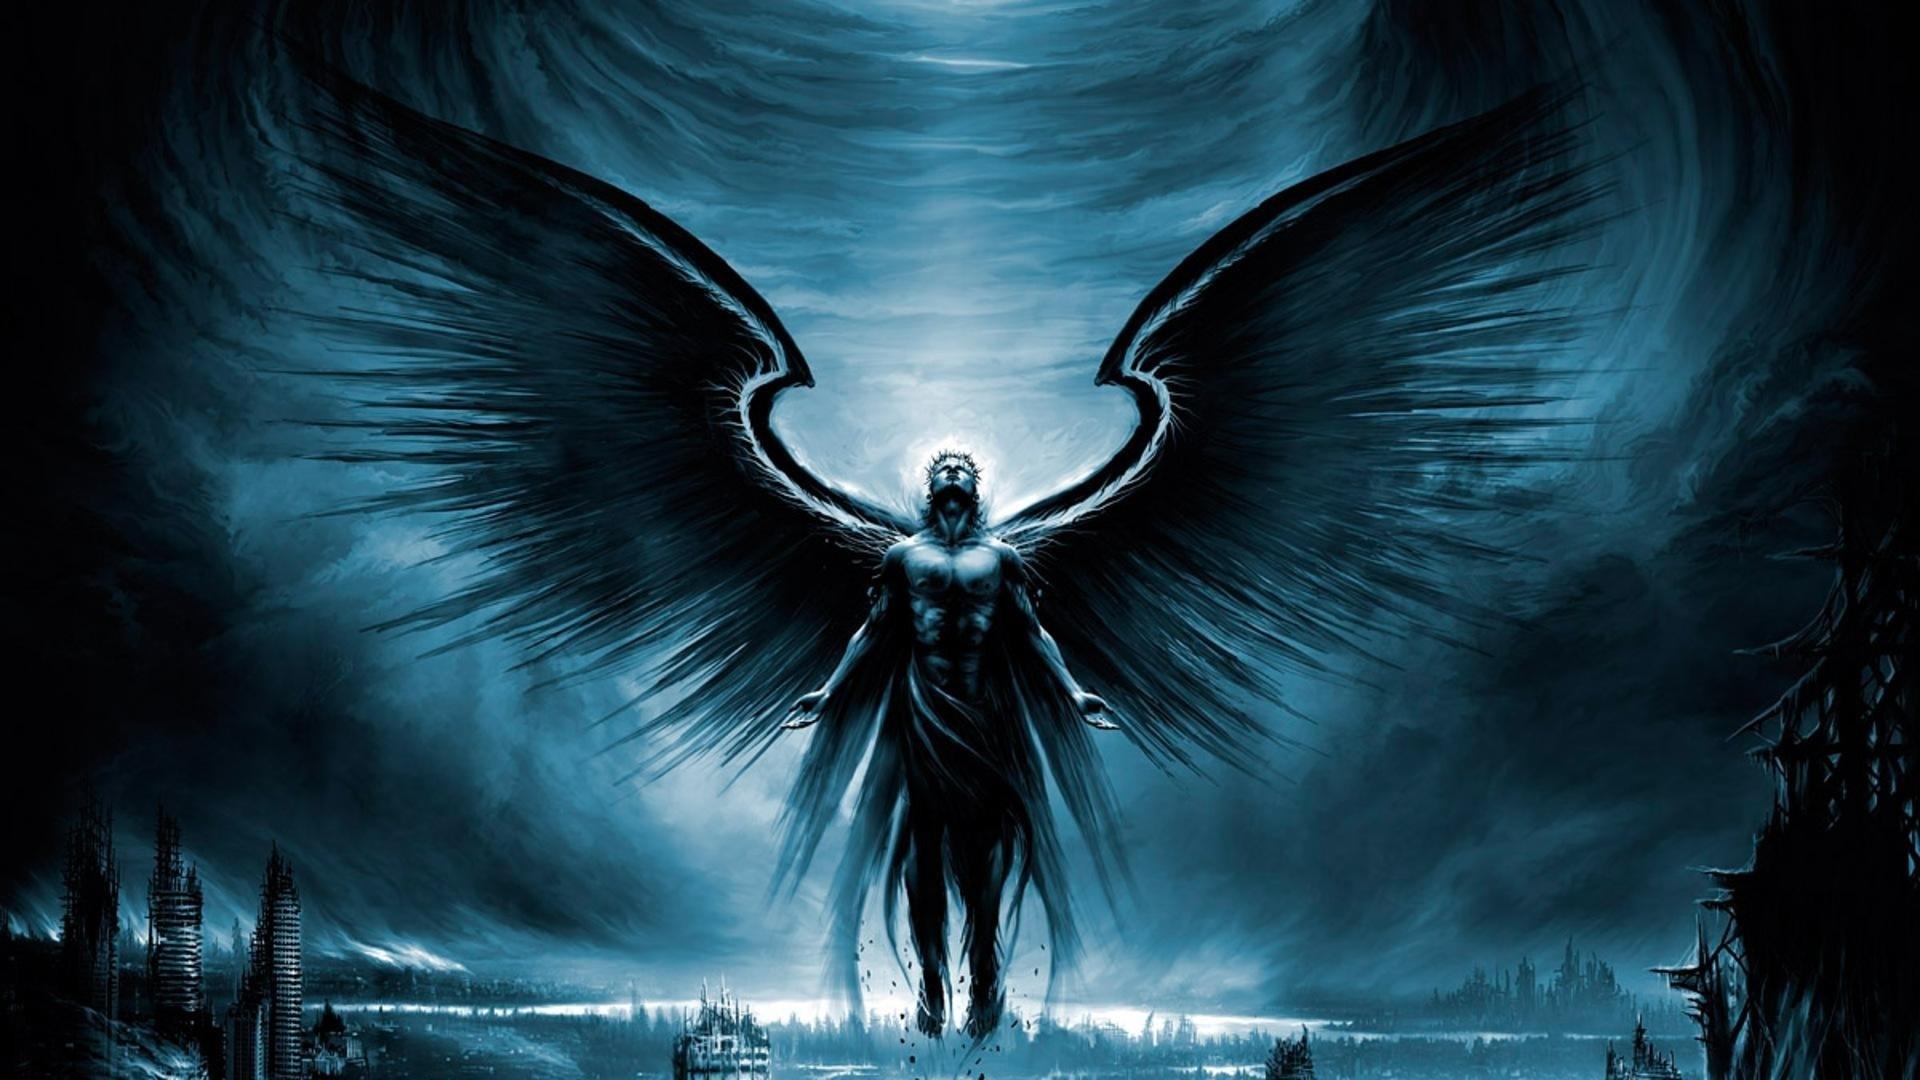 Download Guardian Angel Stock Wallpaper x Full HD | HD Wallpapers |  Pinterest | Dark angel wallpaper, Wallpaper and Angel wallpaper